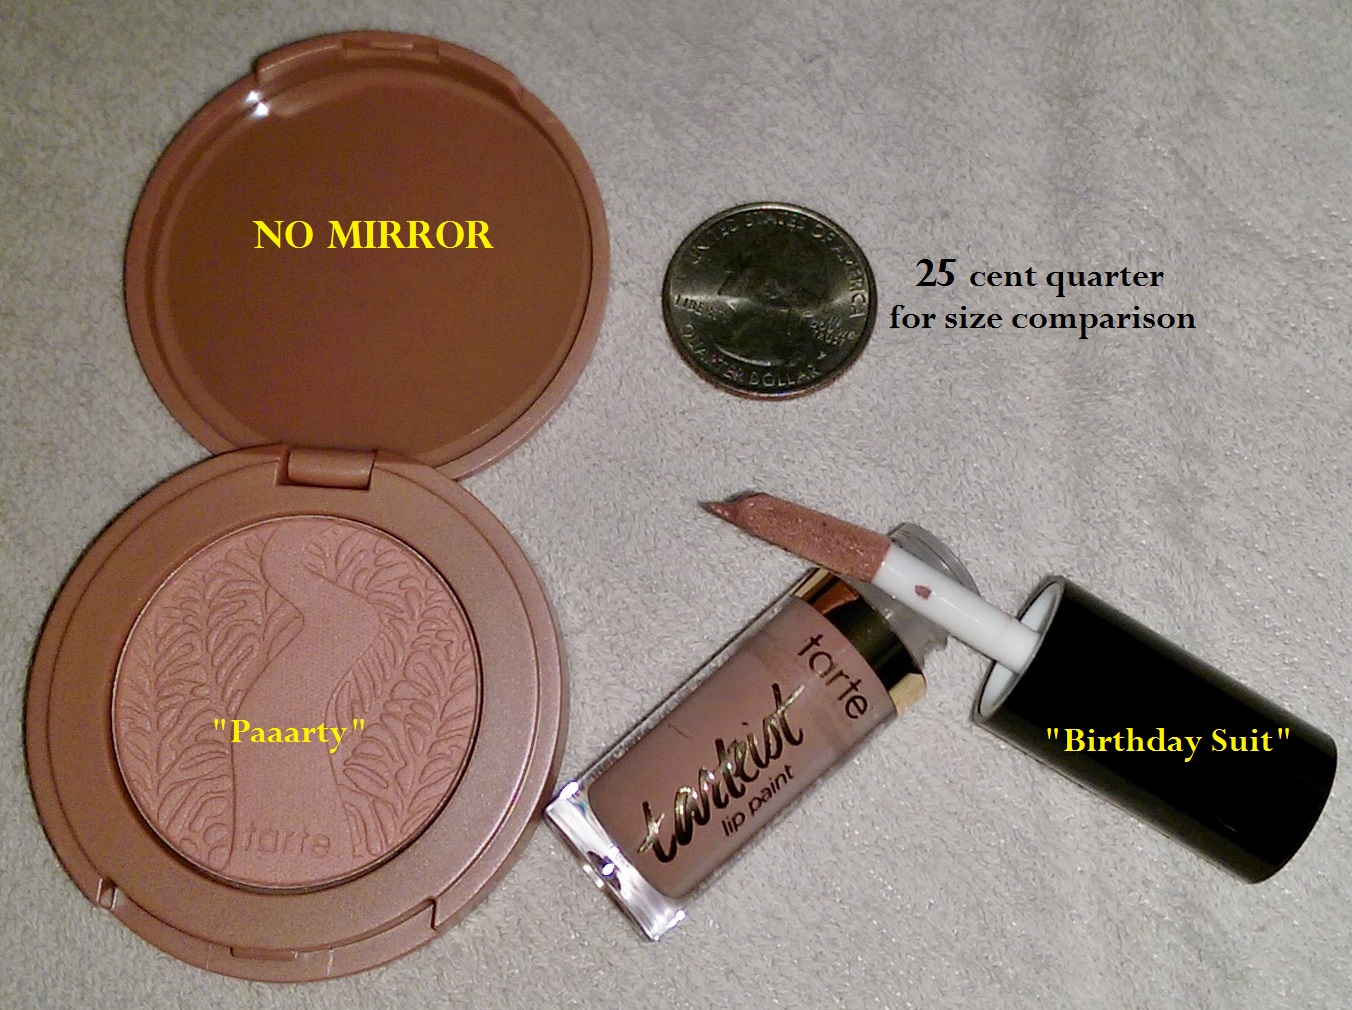 Review Amazonian Clay 12 Hour Blush Tarteist Creamy Matte Lip Paint TARTE SEPHORA Insider Gift